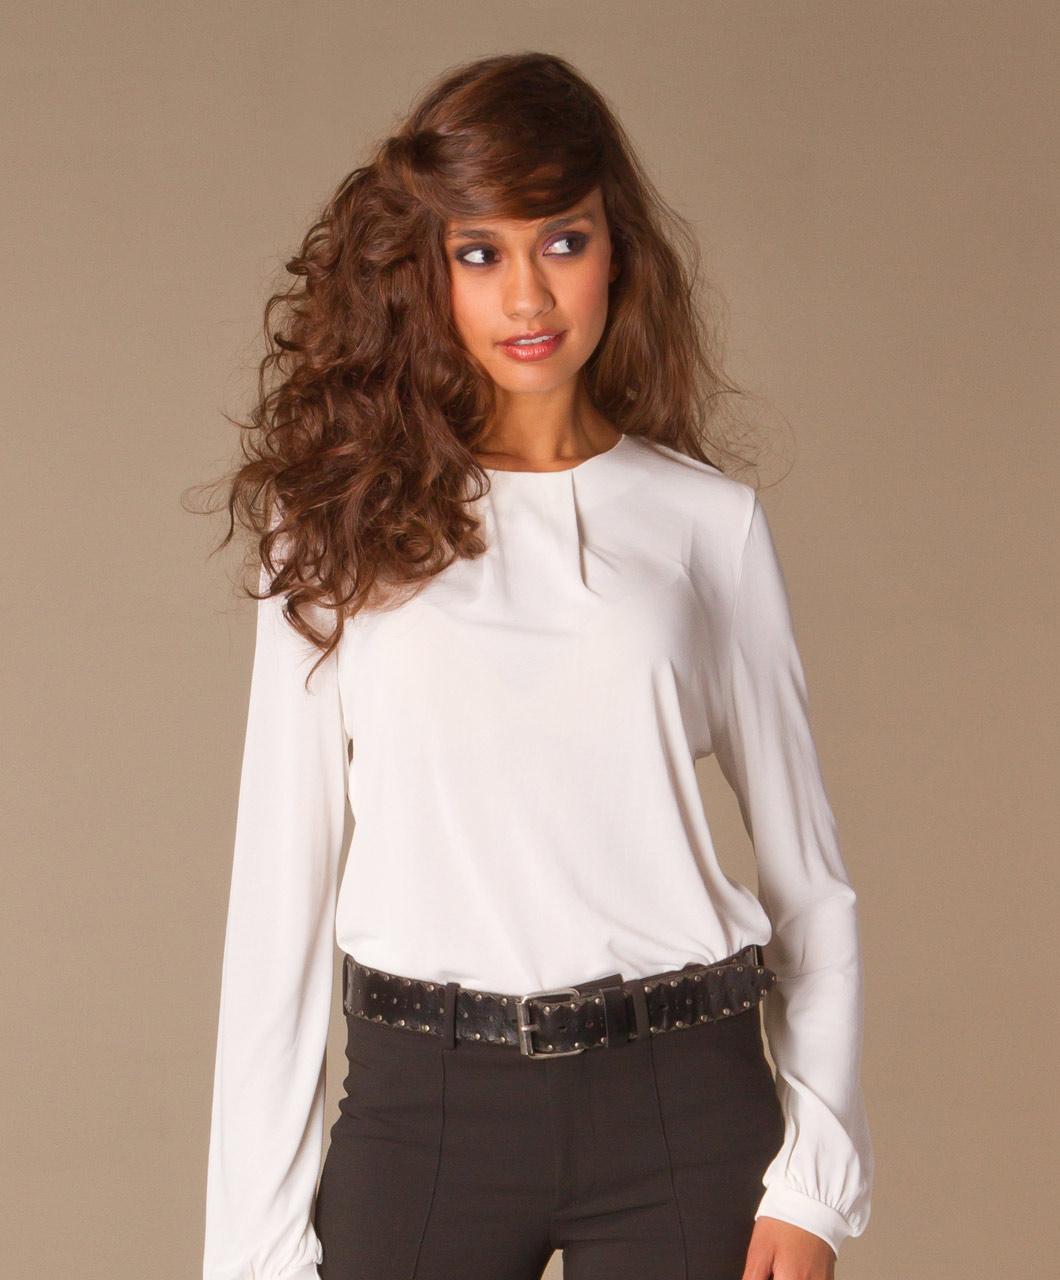 filippa k jersey blouse